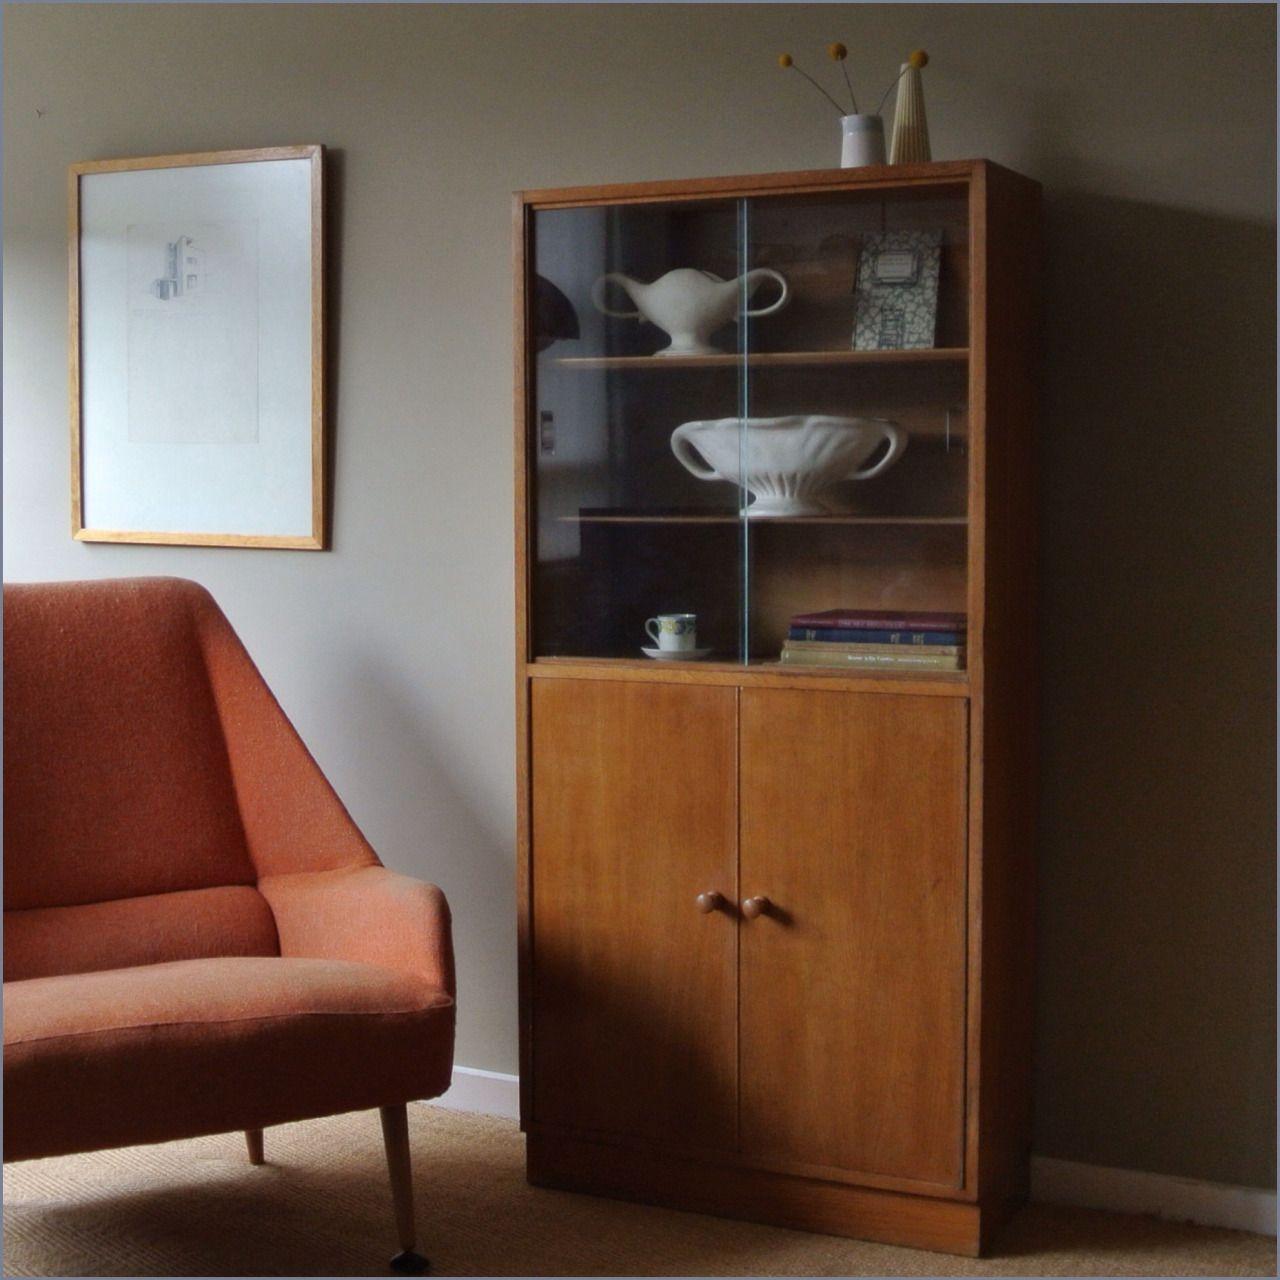 A Cumbrae Range Book Cabinet By Neil Morris For H Morris Co Ltd